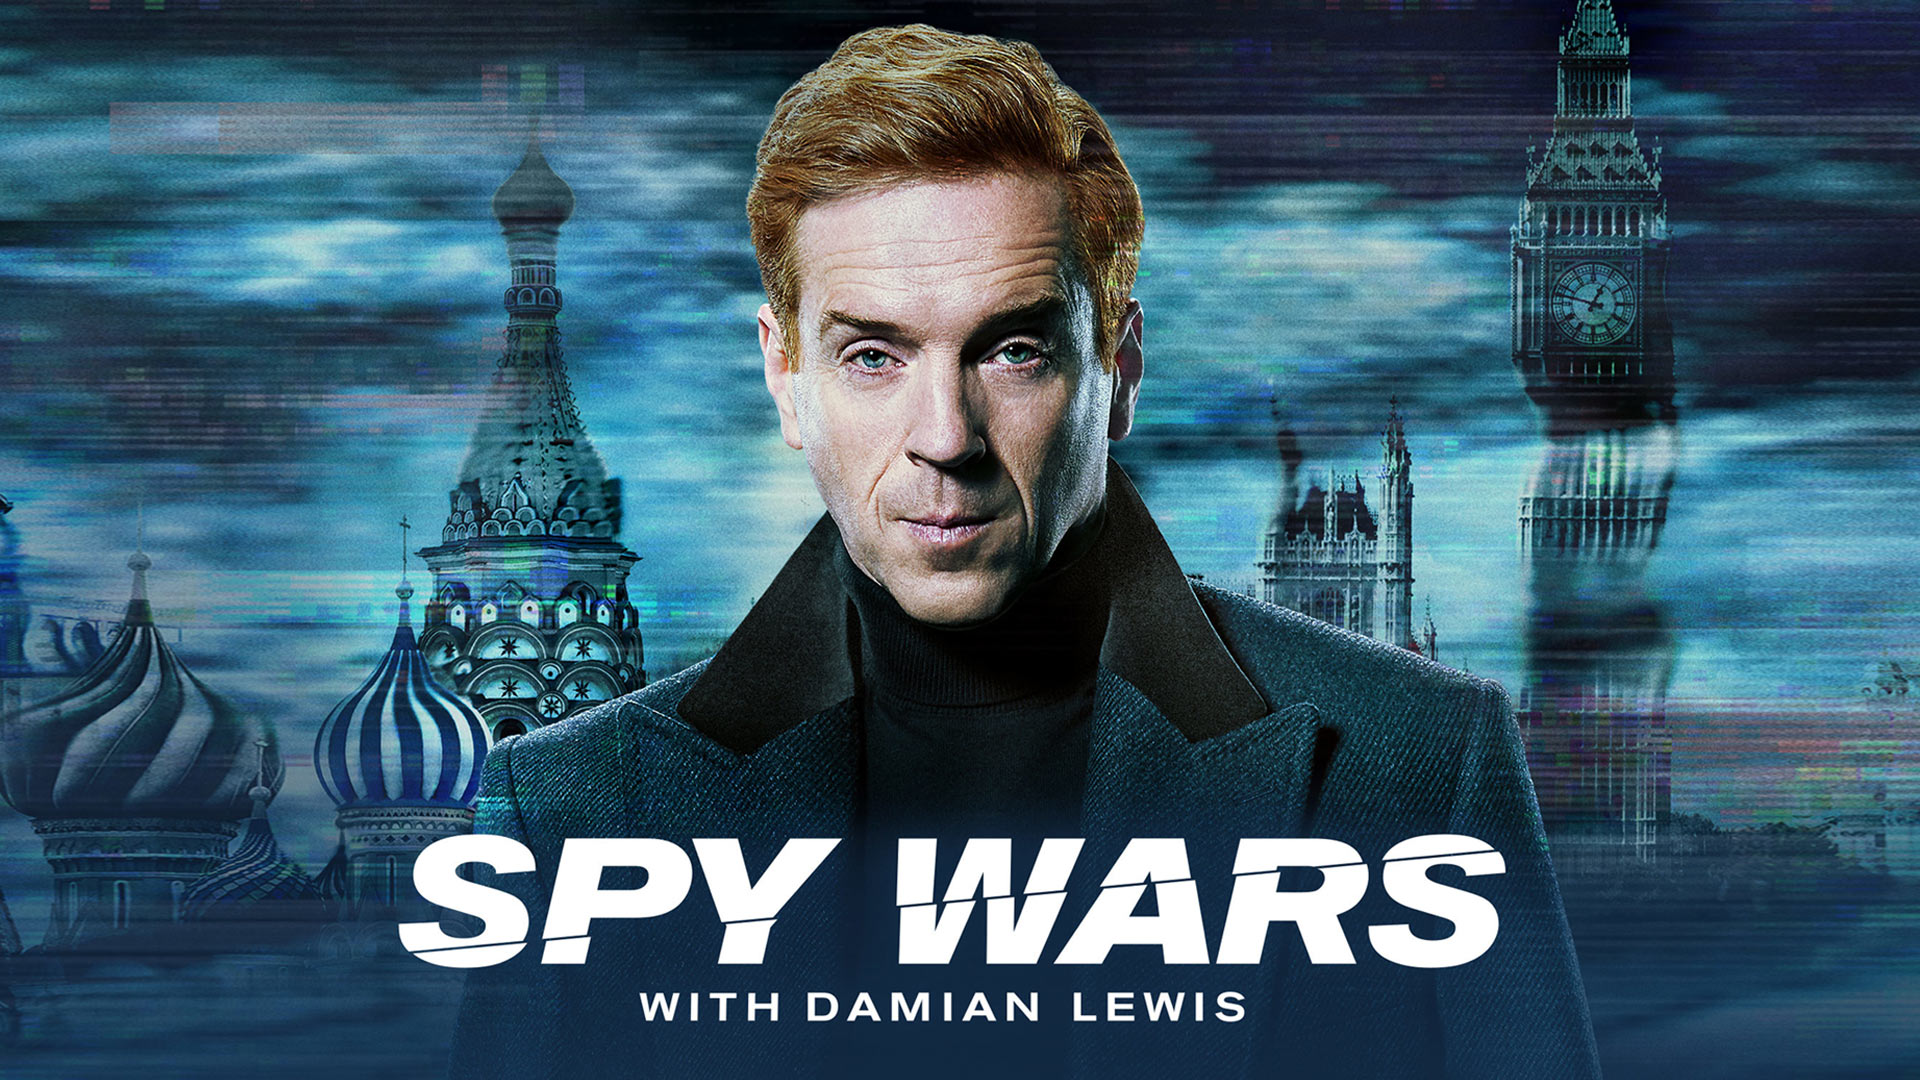 Spy Wars with Damian Lewis - Season 1